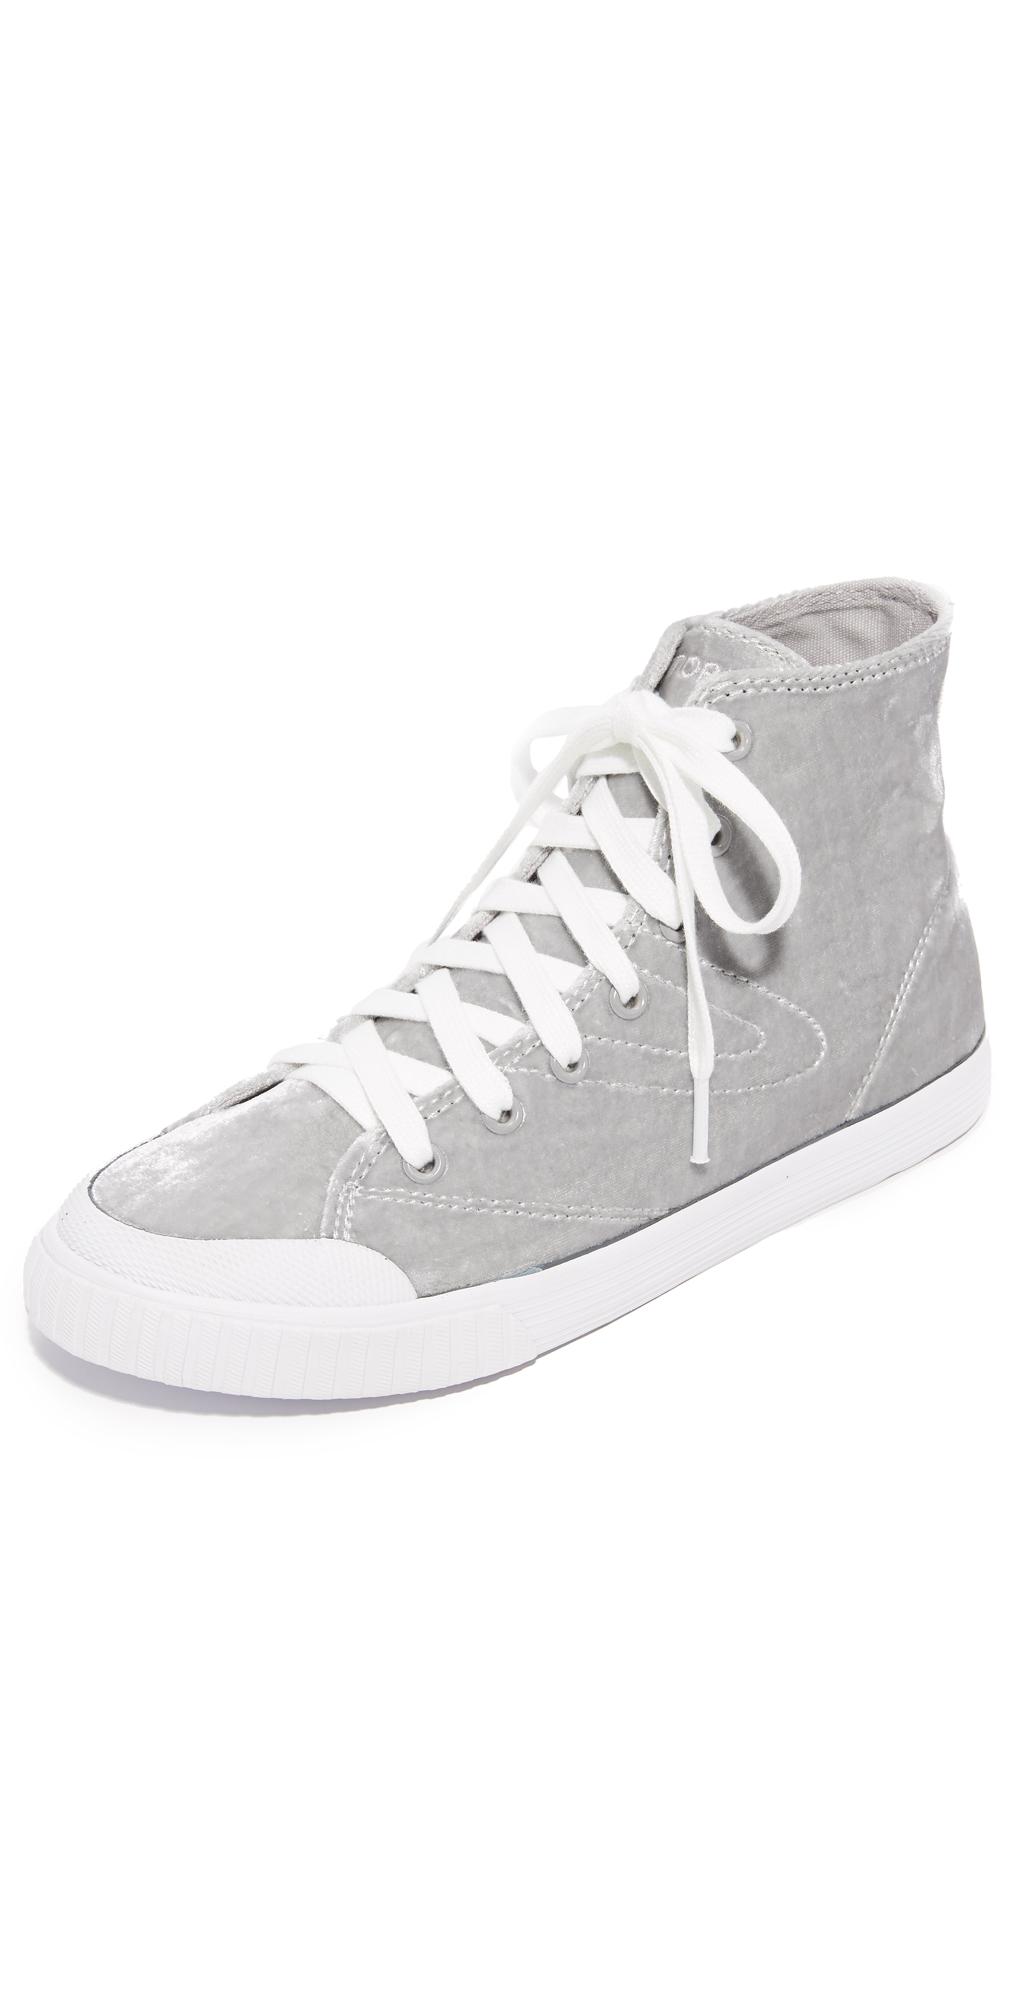 Marley Velvet High Top Sneakers Tretorn